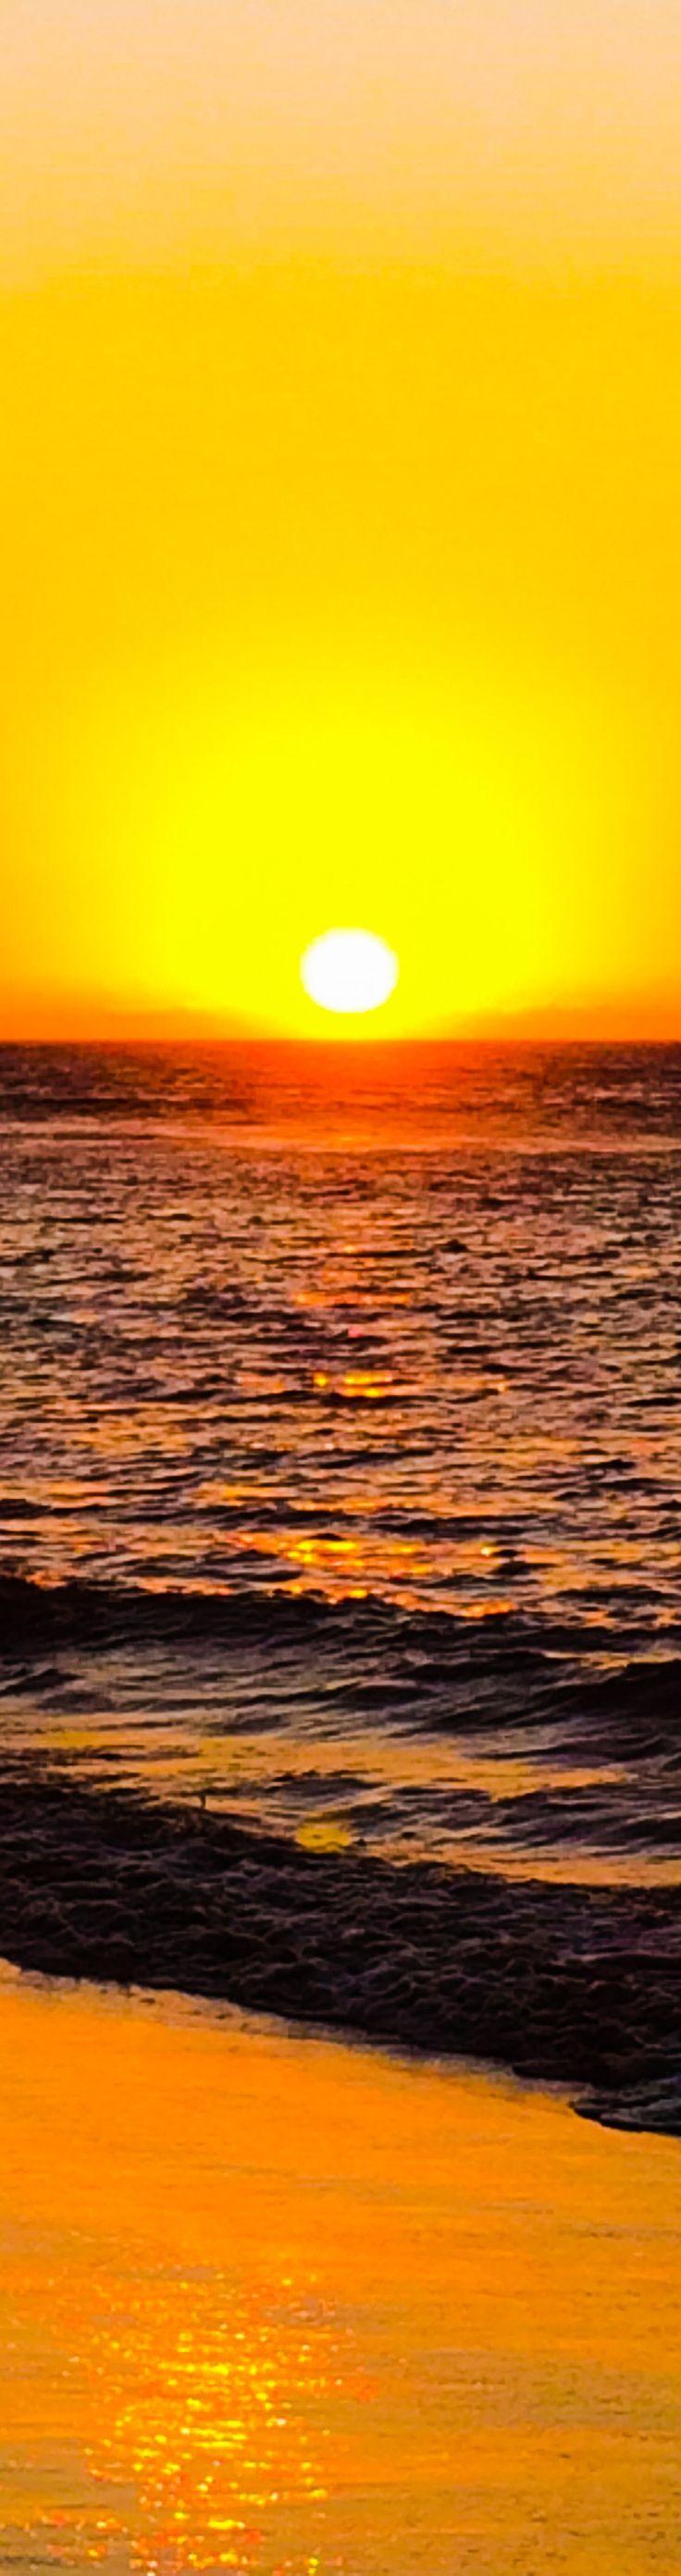 Amazing sunset in Mancora beach, Piura, Peru